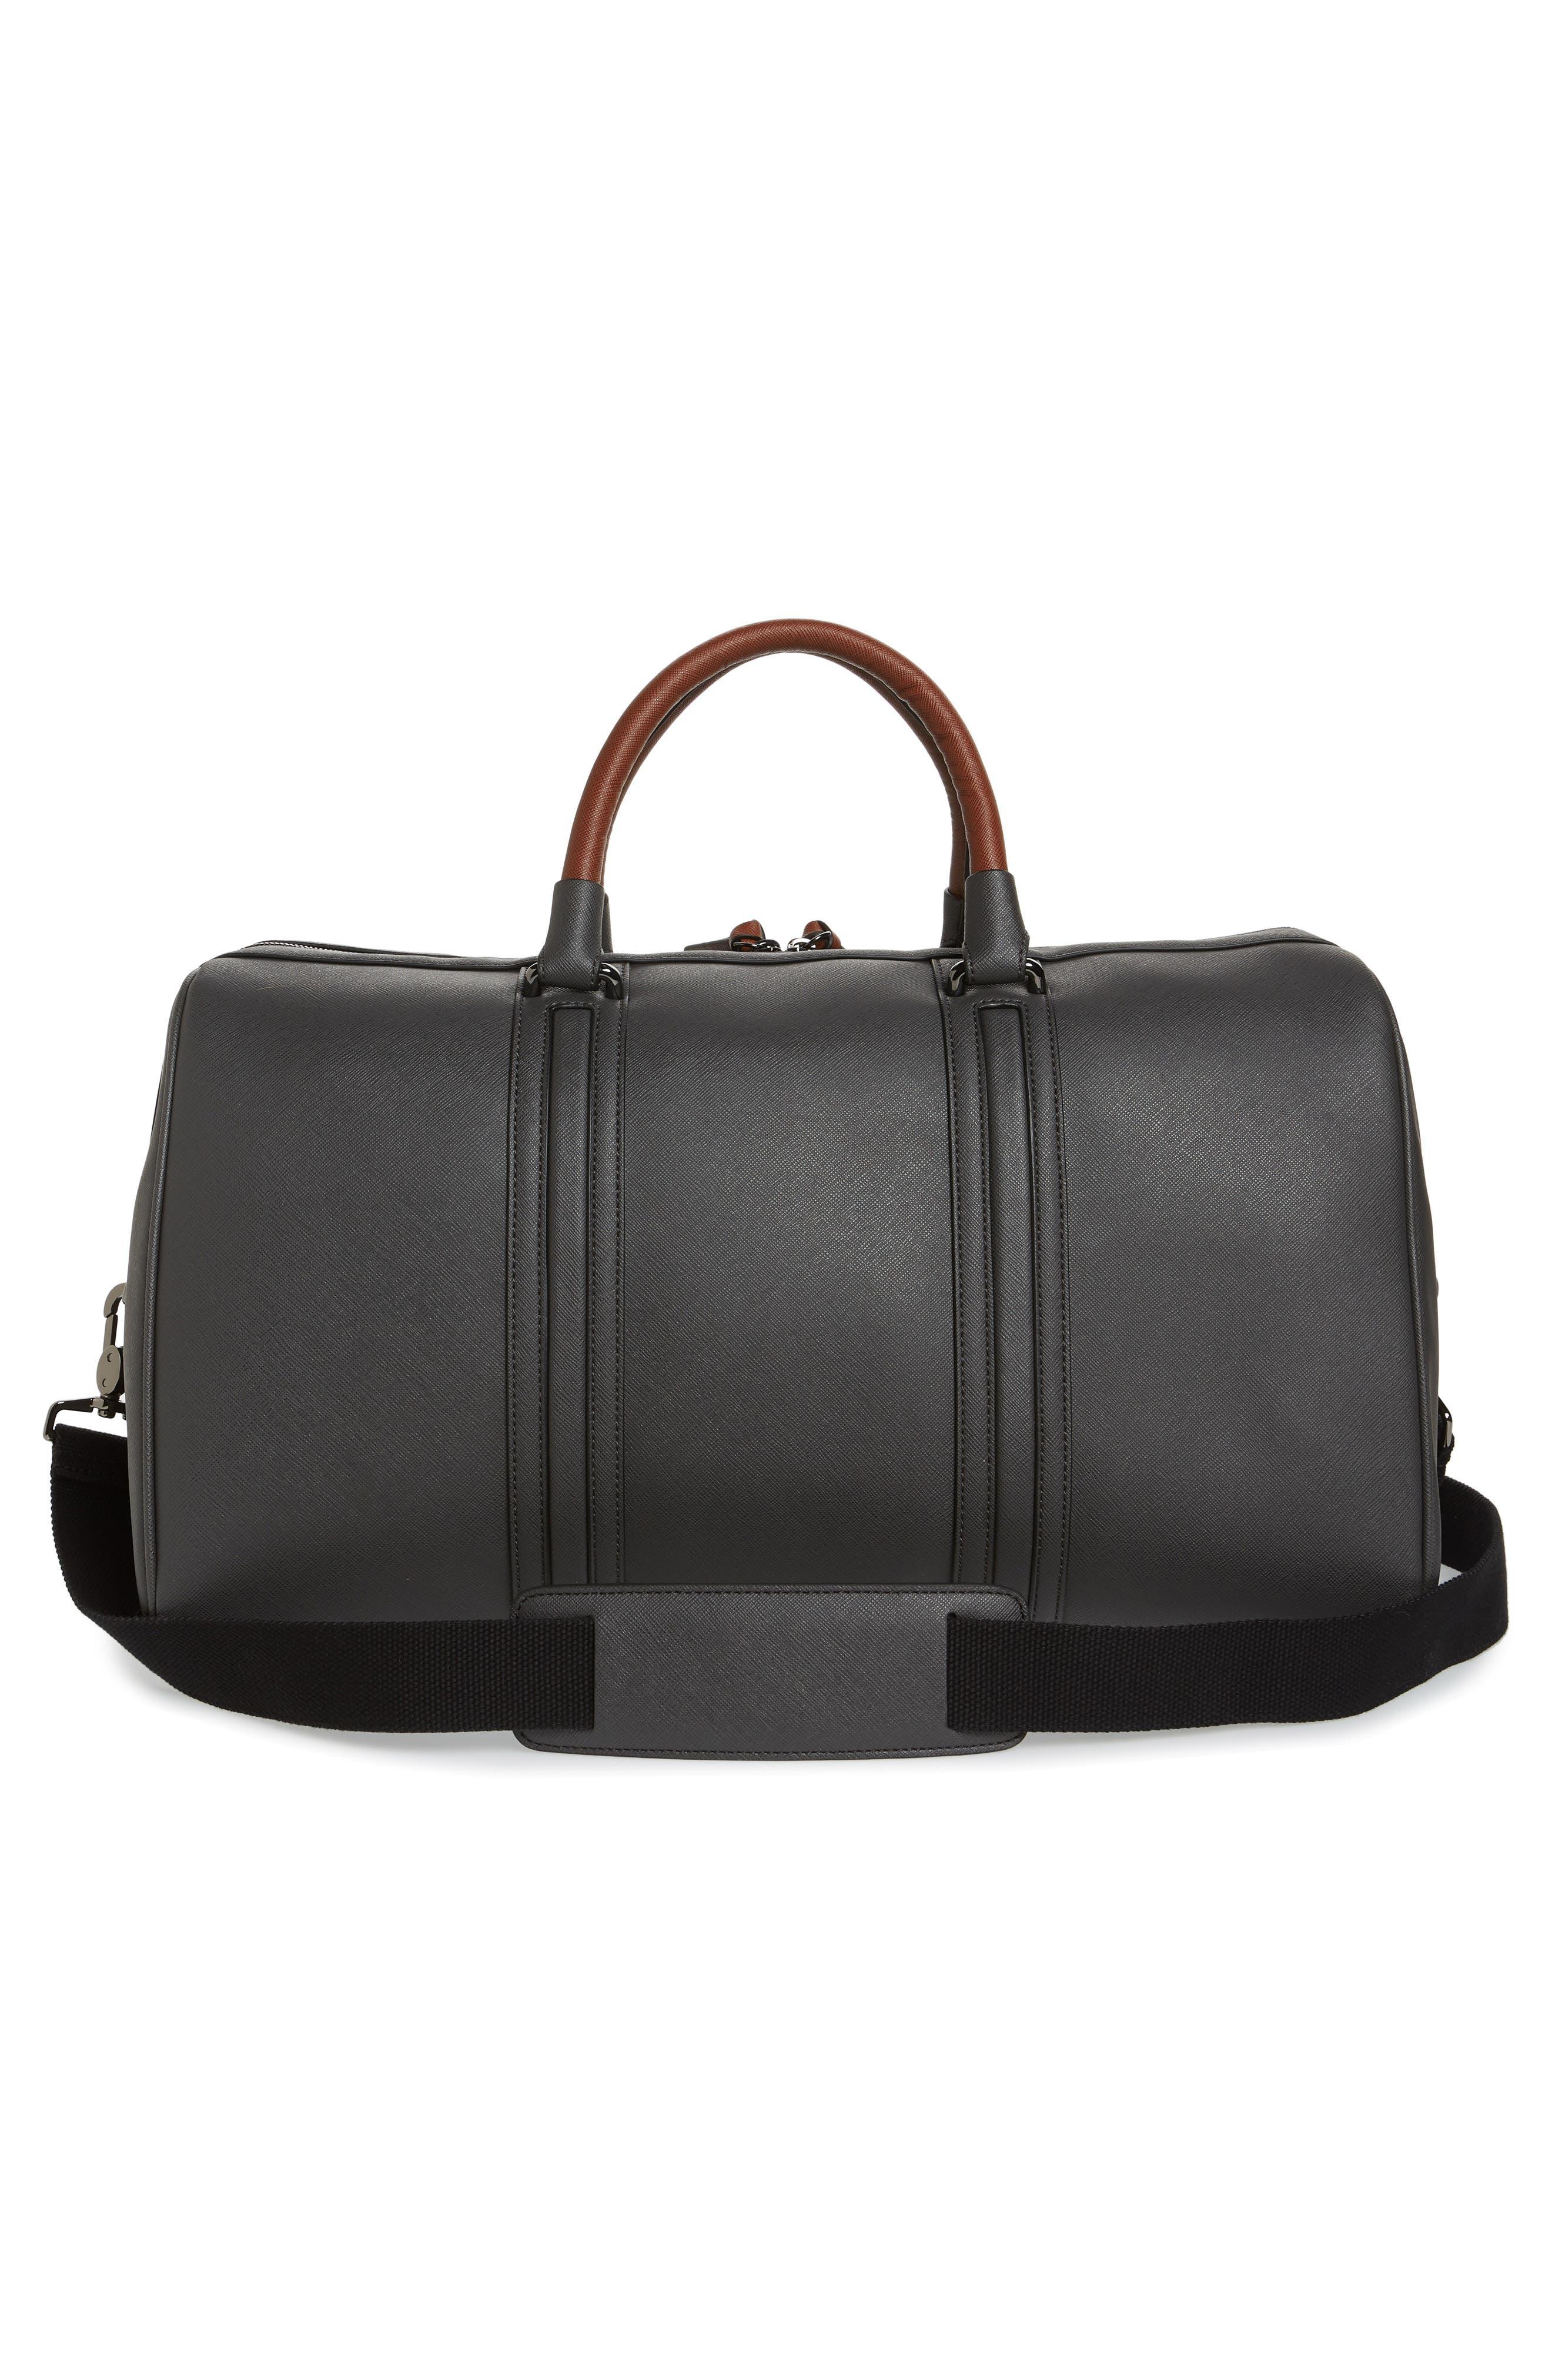 Grankan Faux Leather Duffel Bag,                             Alternate thumbnail 3, color,                             CHARCOAL